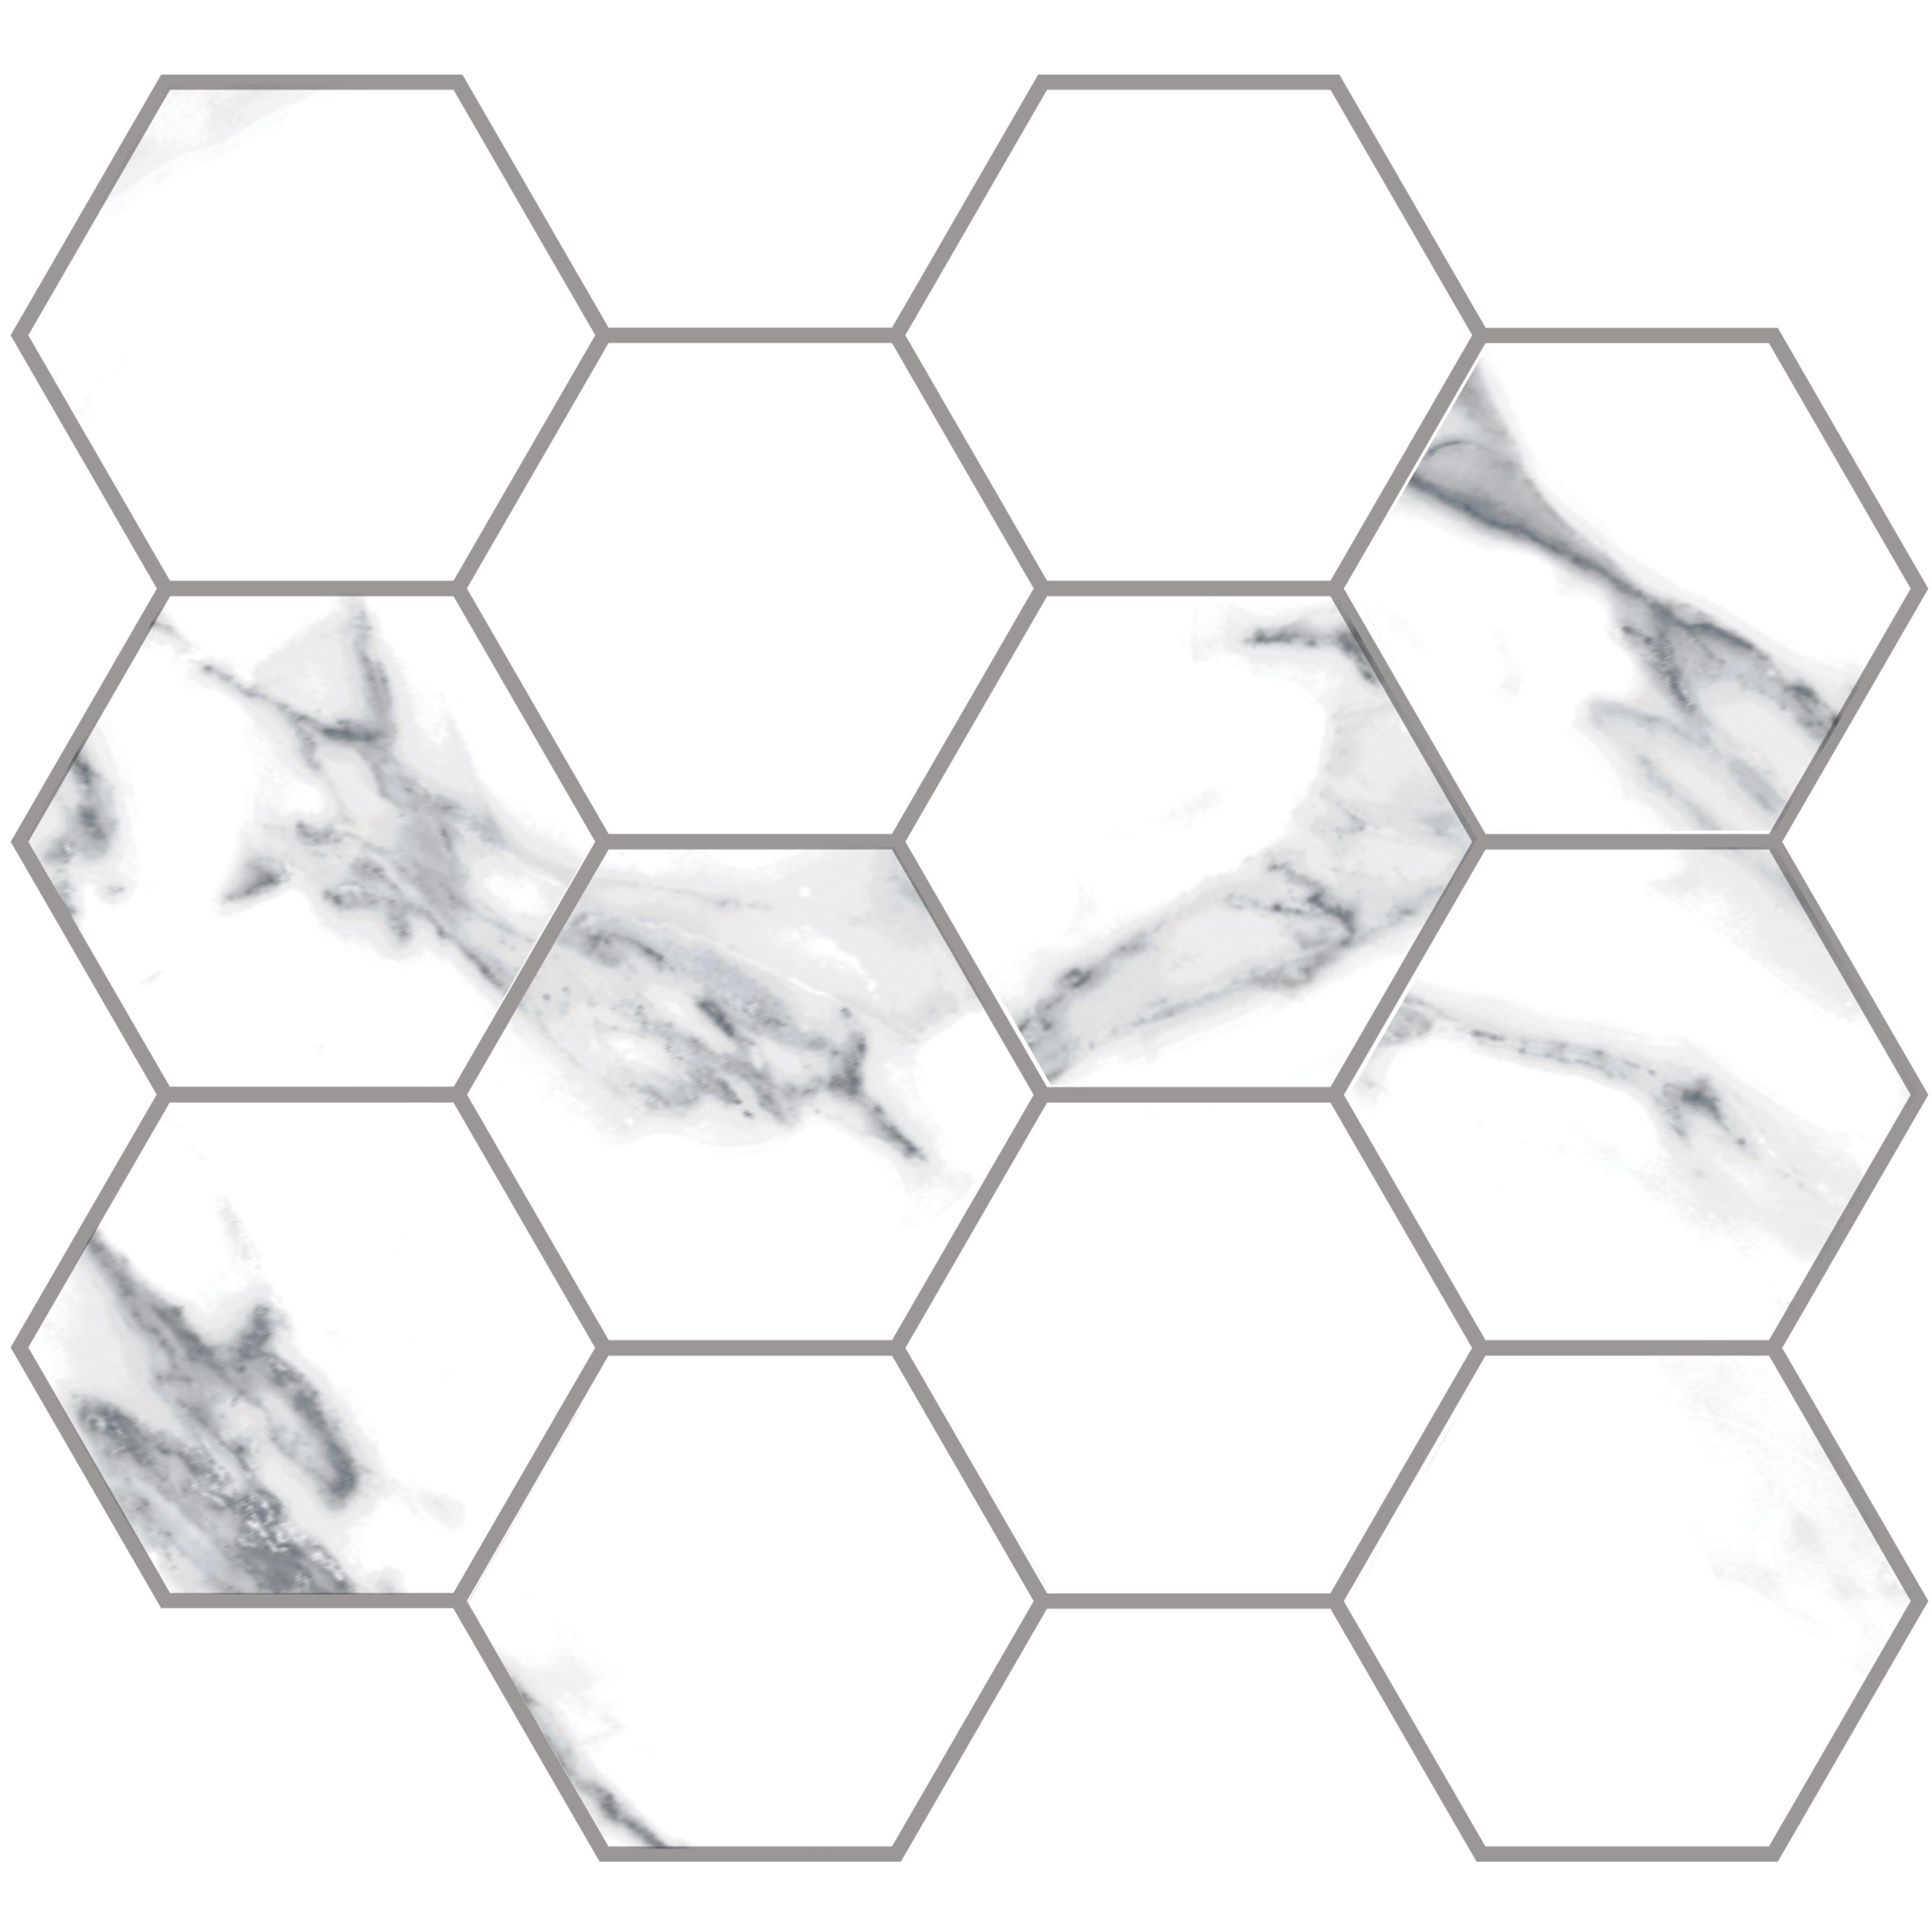 "Statuario Extra / 3.25"" Hexagon - 10""x11.5"" Sheet / Glossy Porcelain Tile - Statuario Marble 0"